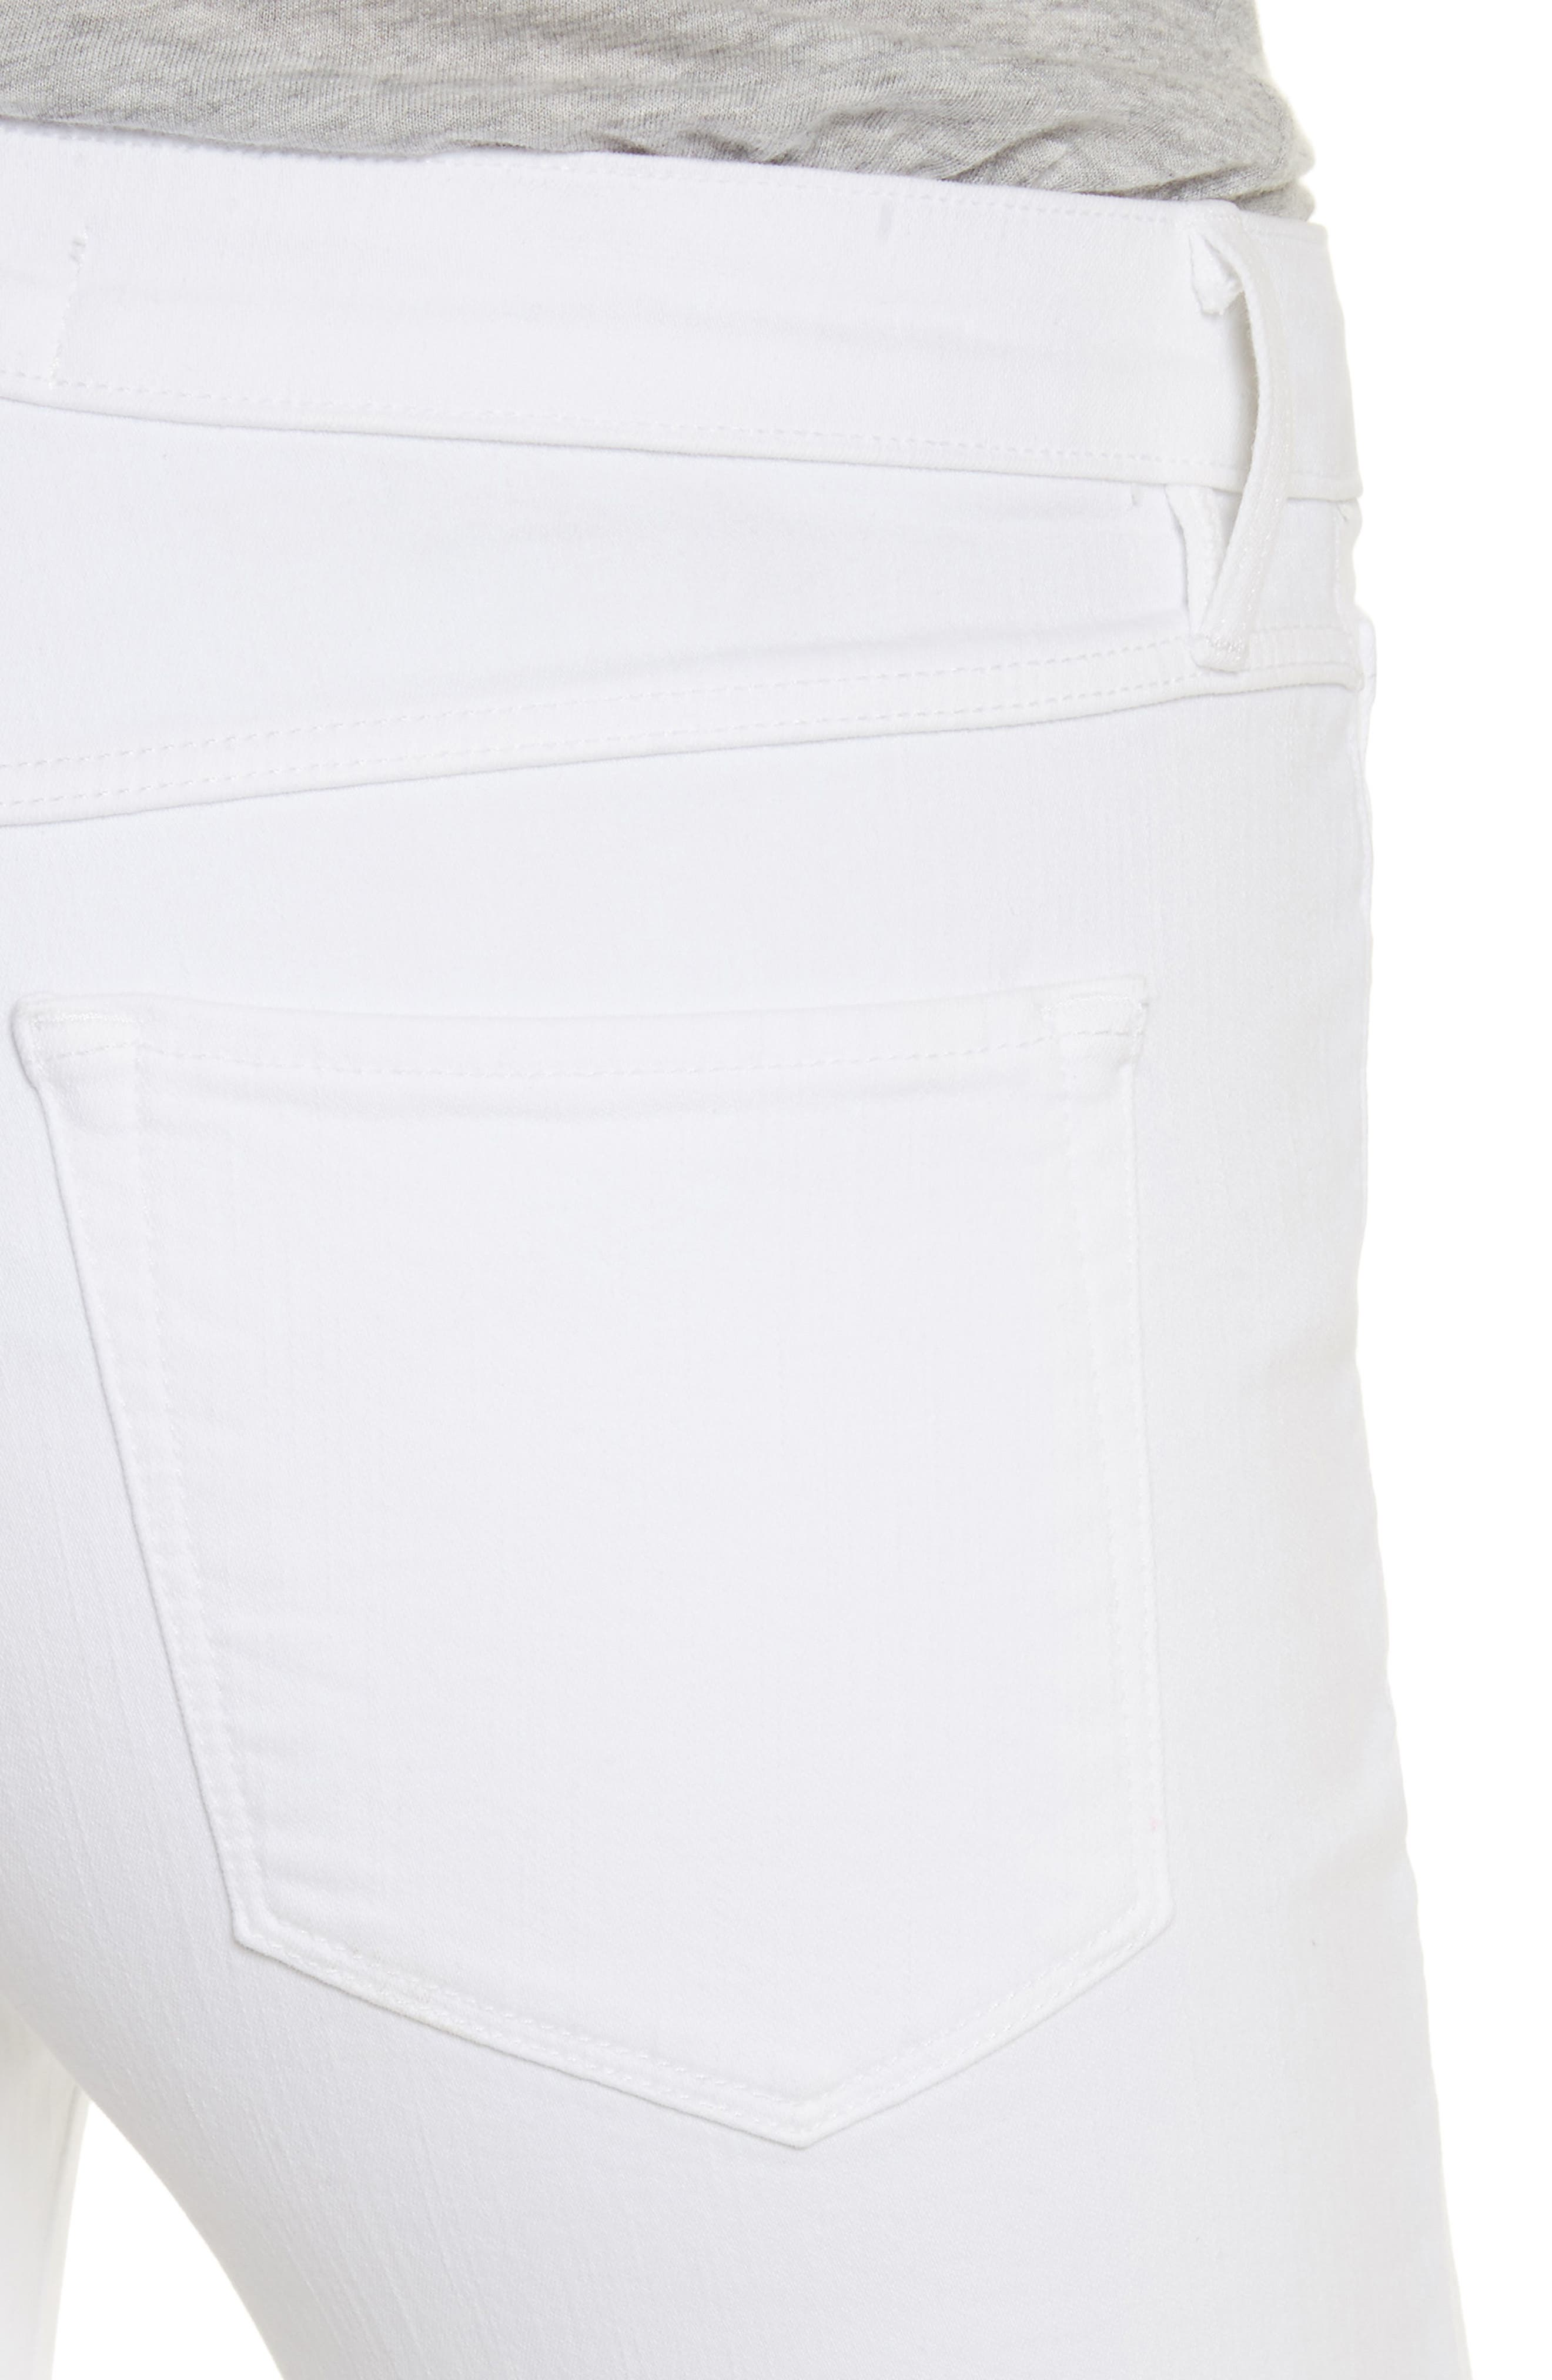 W2 Crop Skinny Jeans,                             Alternate thumbnail 4, color,                             White Tear